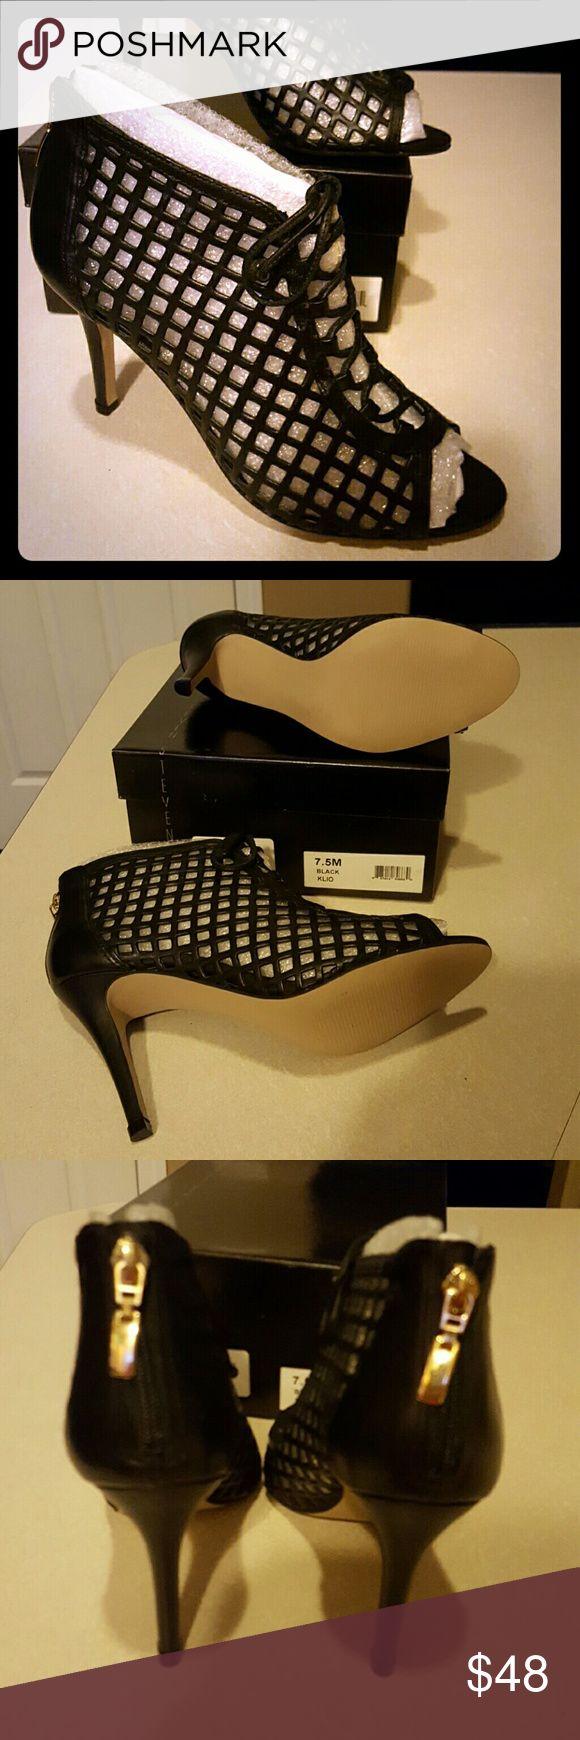 New Steve Madden Brand new Steve Madden Klio heels, gorgeous, sexy and versatile, 7.5, black heel is 4 inches. Steve Madden Shoes Heels